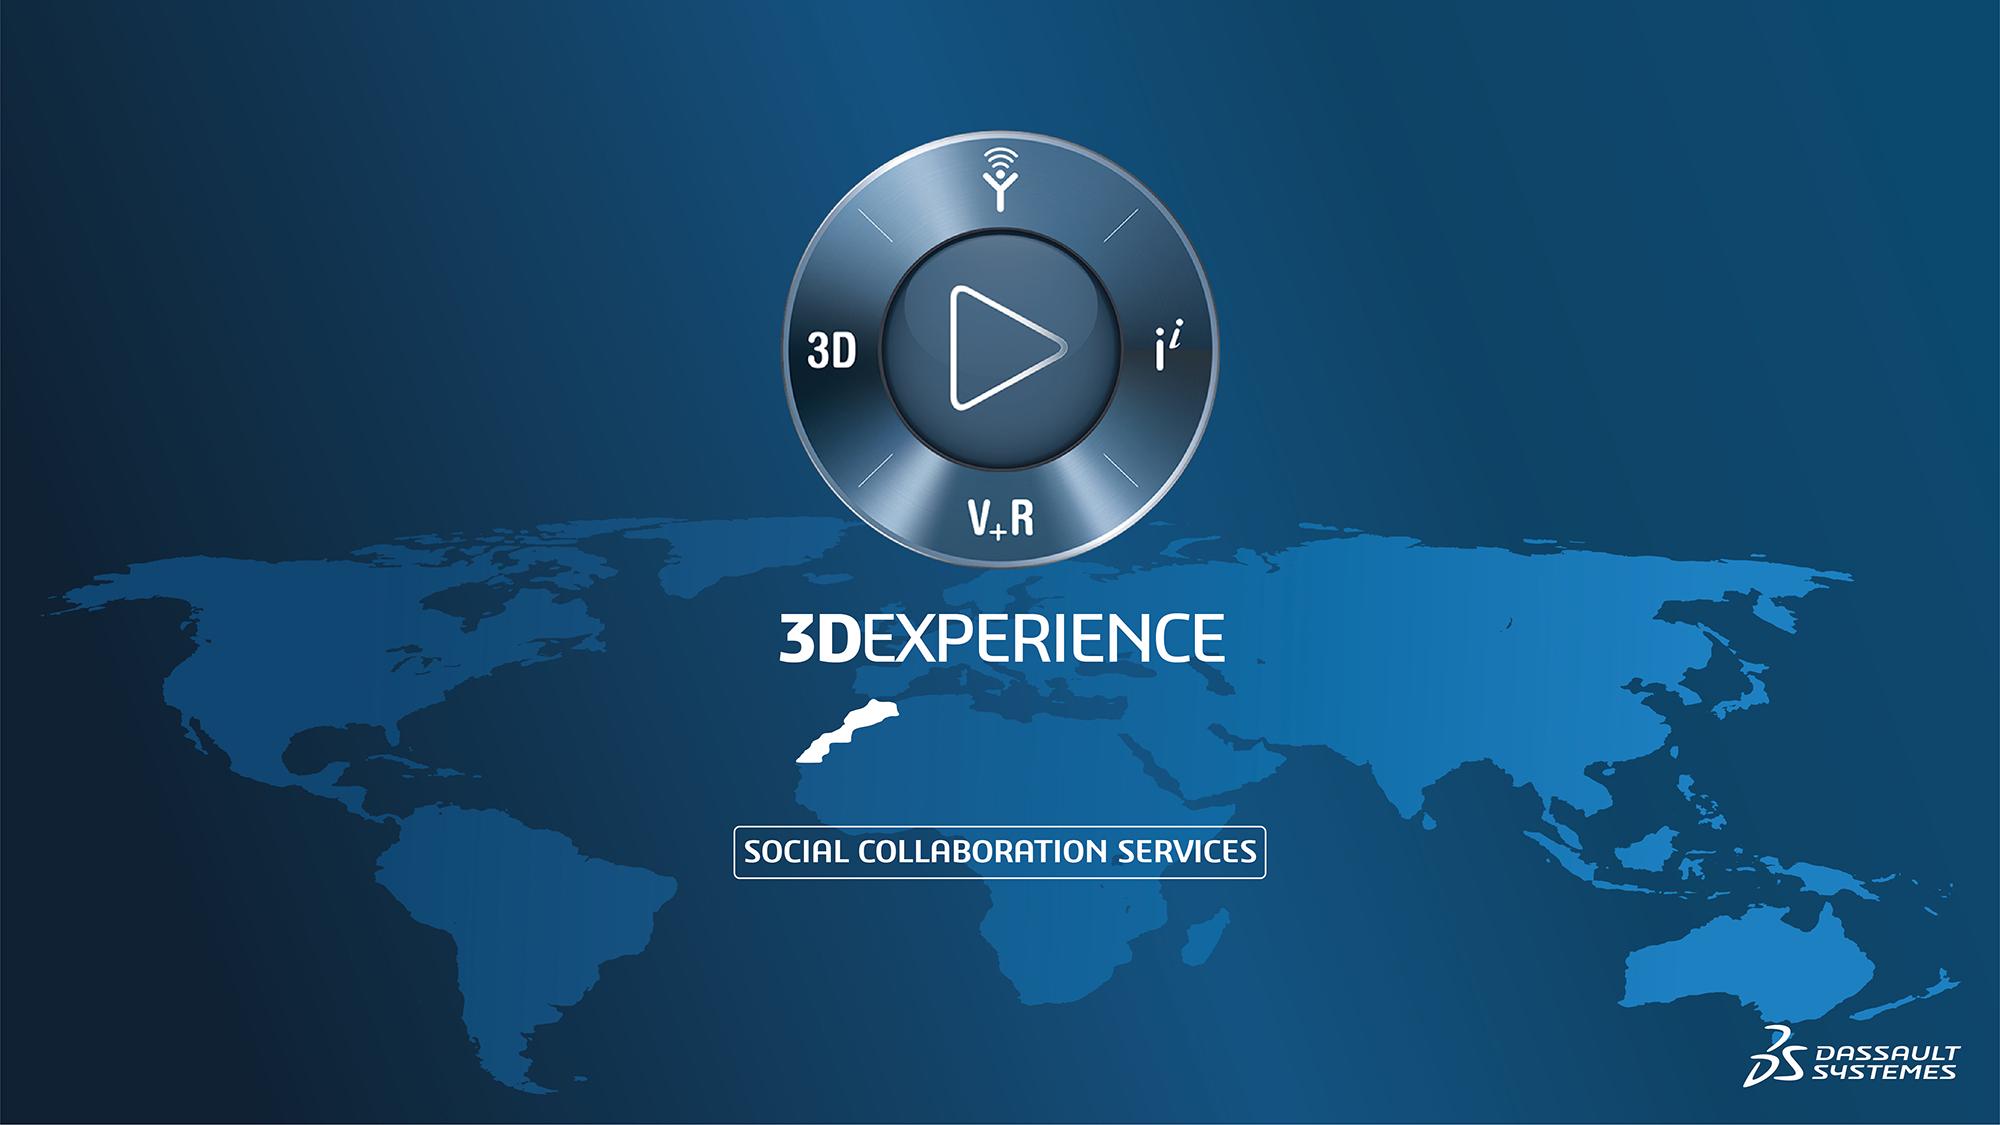 LA PLATEFORME 3DEXPERIENCE